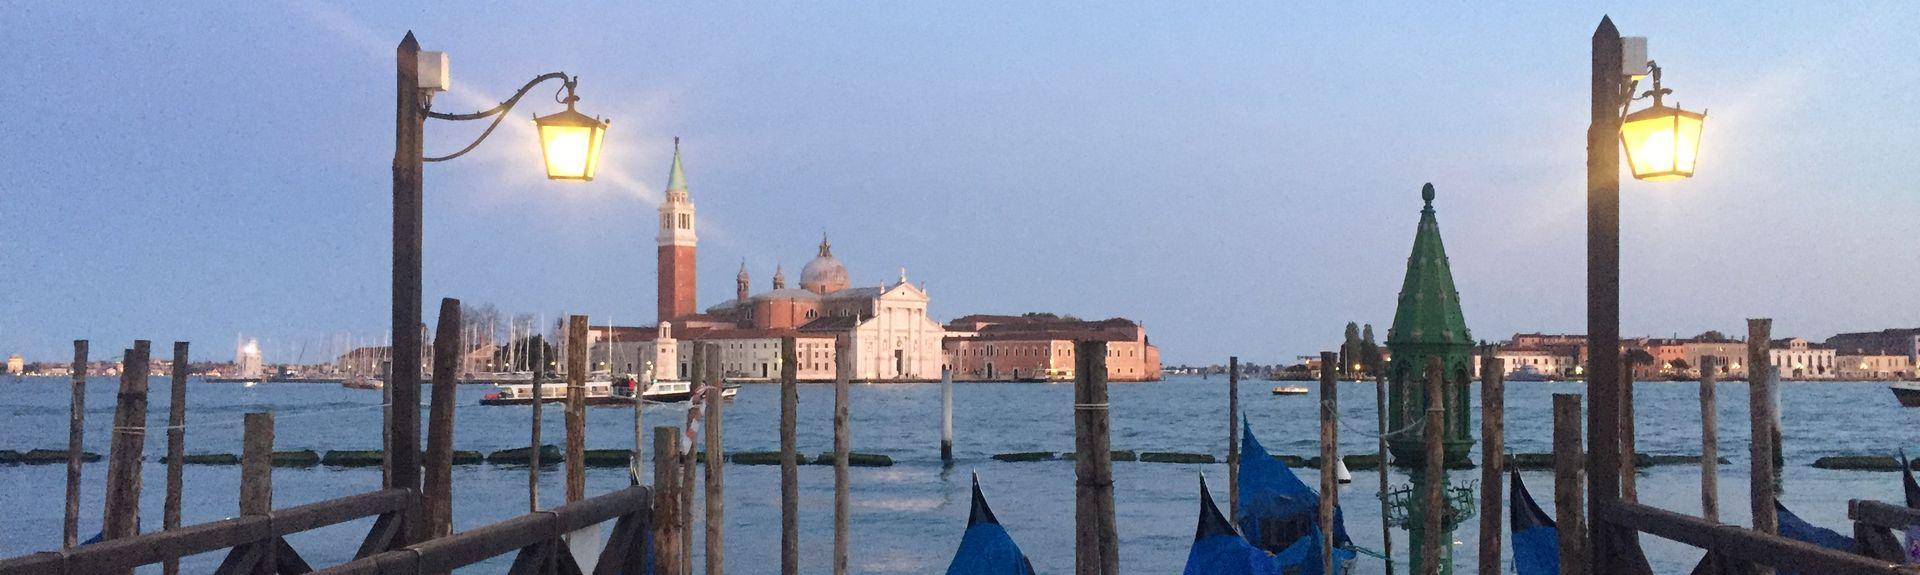 Circolo Golf Venezia Alberoni, Venedig Strand, Veneto, Italien